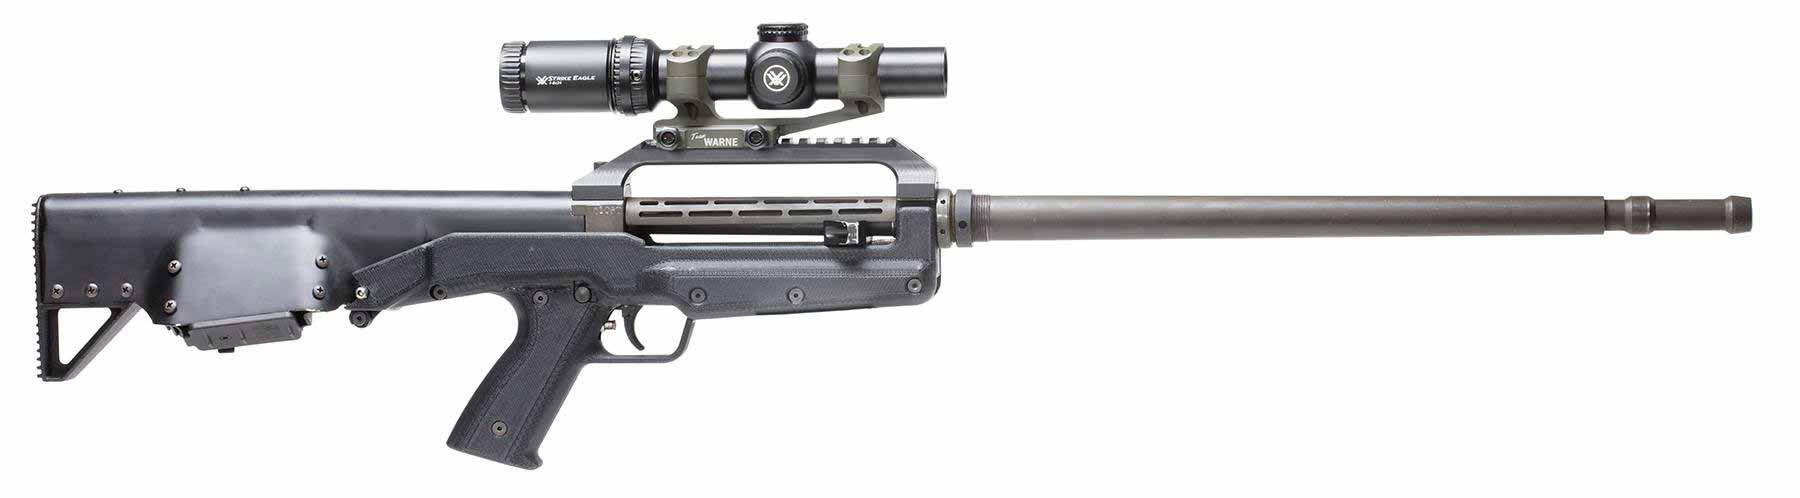 Прототип буллпап винтовки Kel-Tec .308